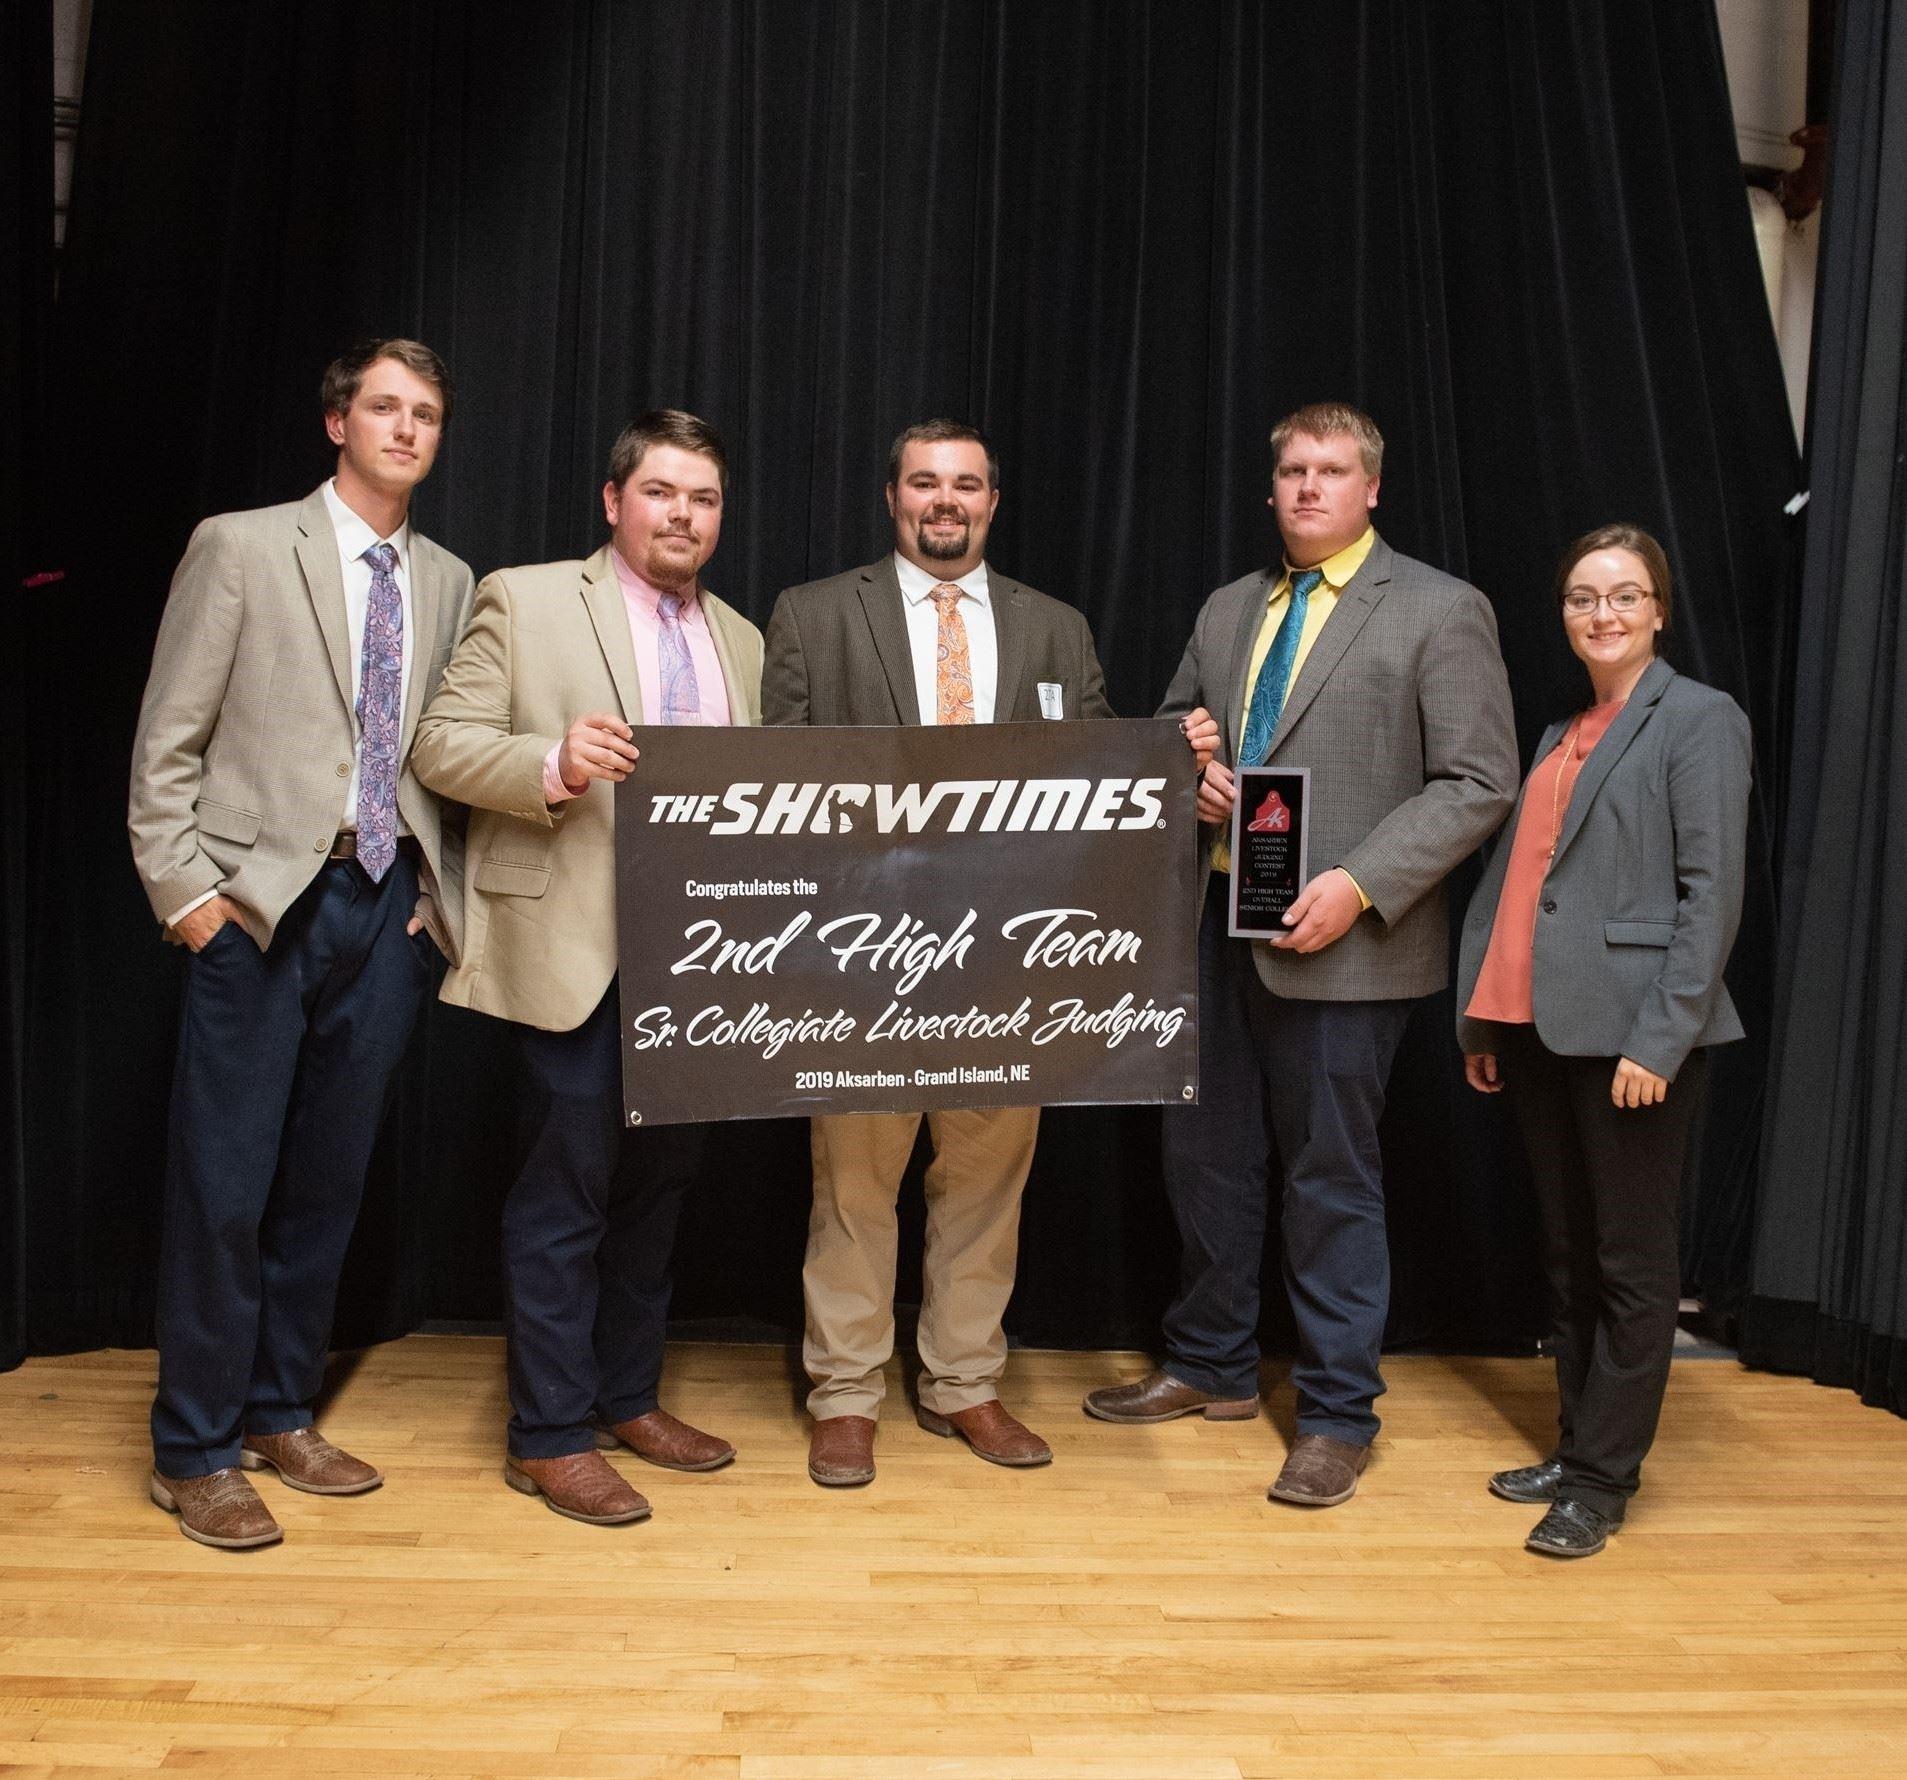 2019 2nd High Team Sr. Collegiate Livestock Judging